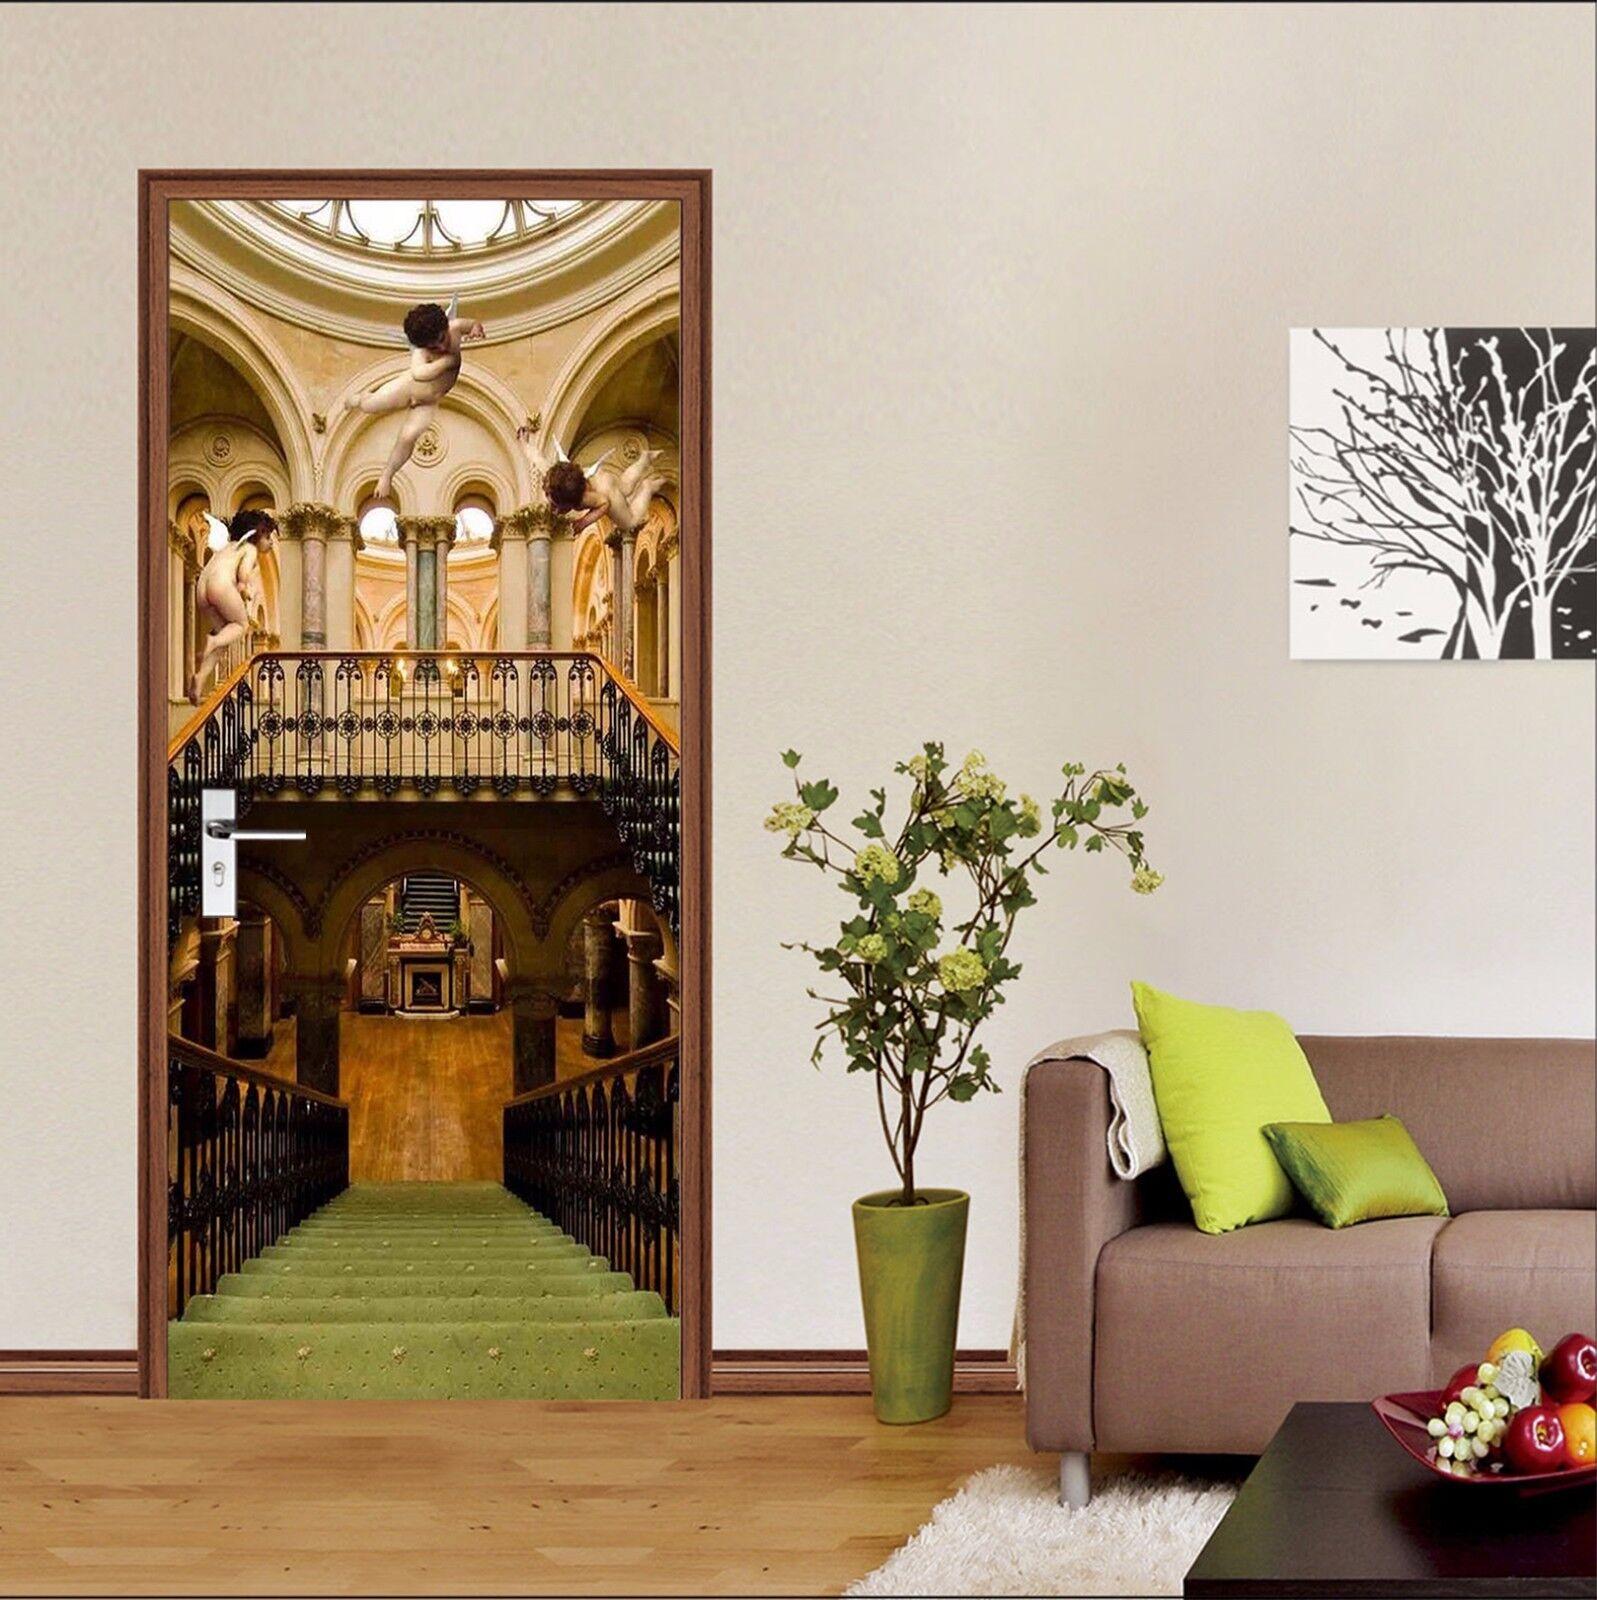 3D Engel 742 Tür Wandmalerei Wandaufkleber Aufkleber AJ WALLPAPER DE Kyra